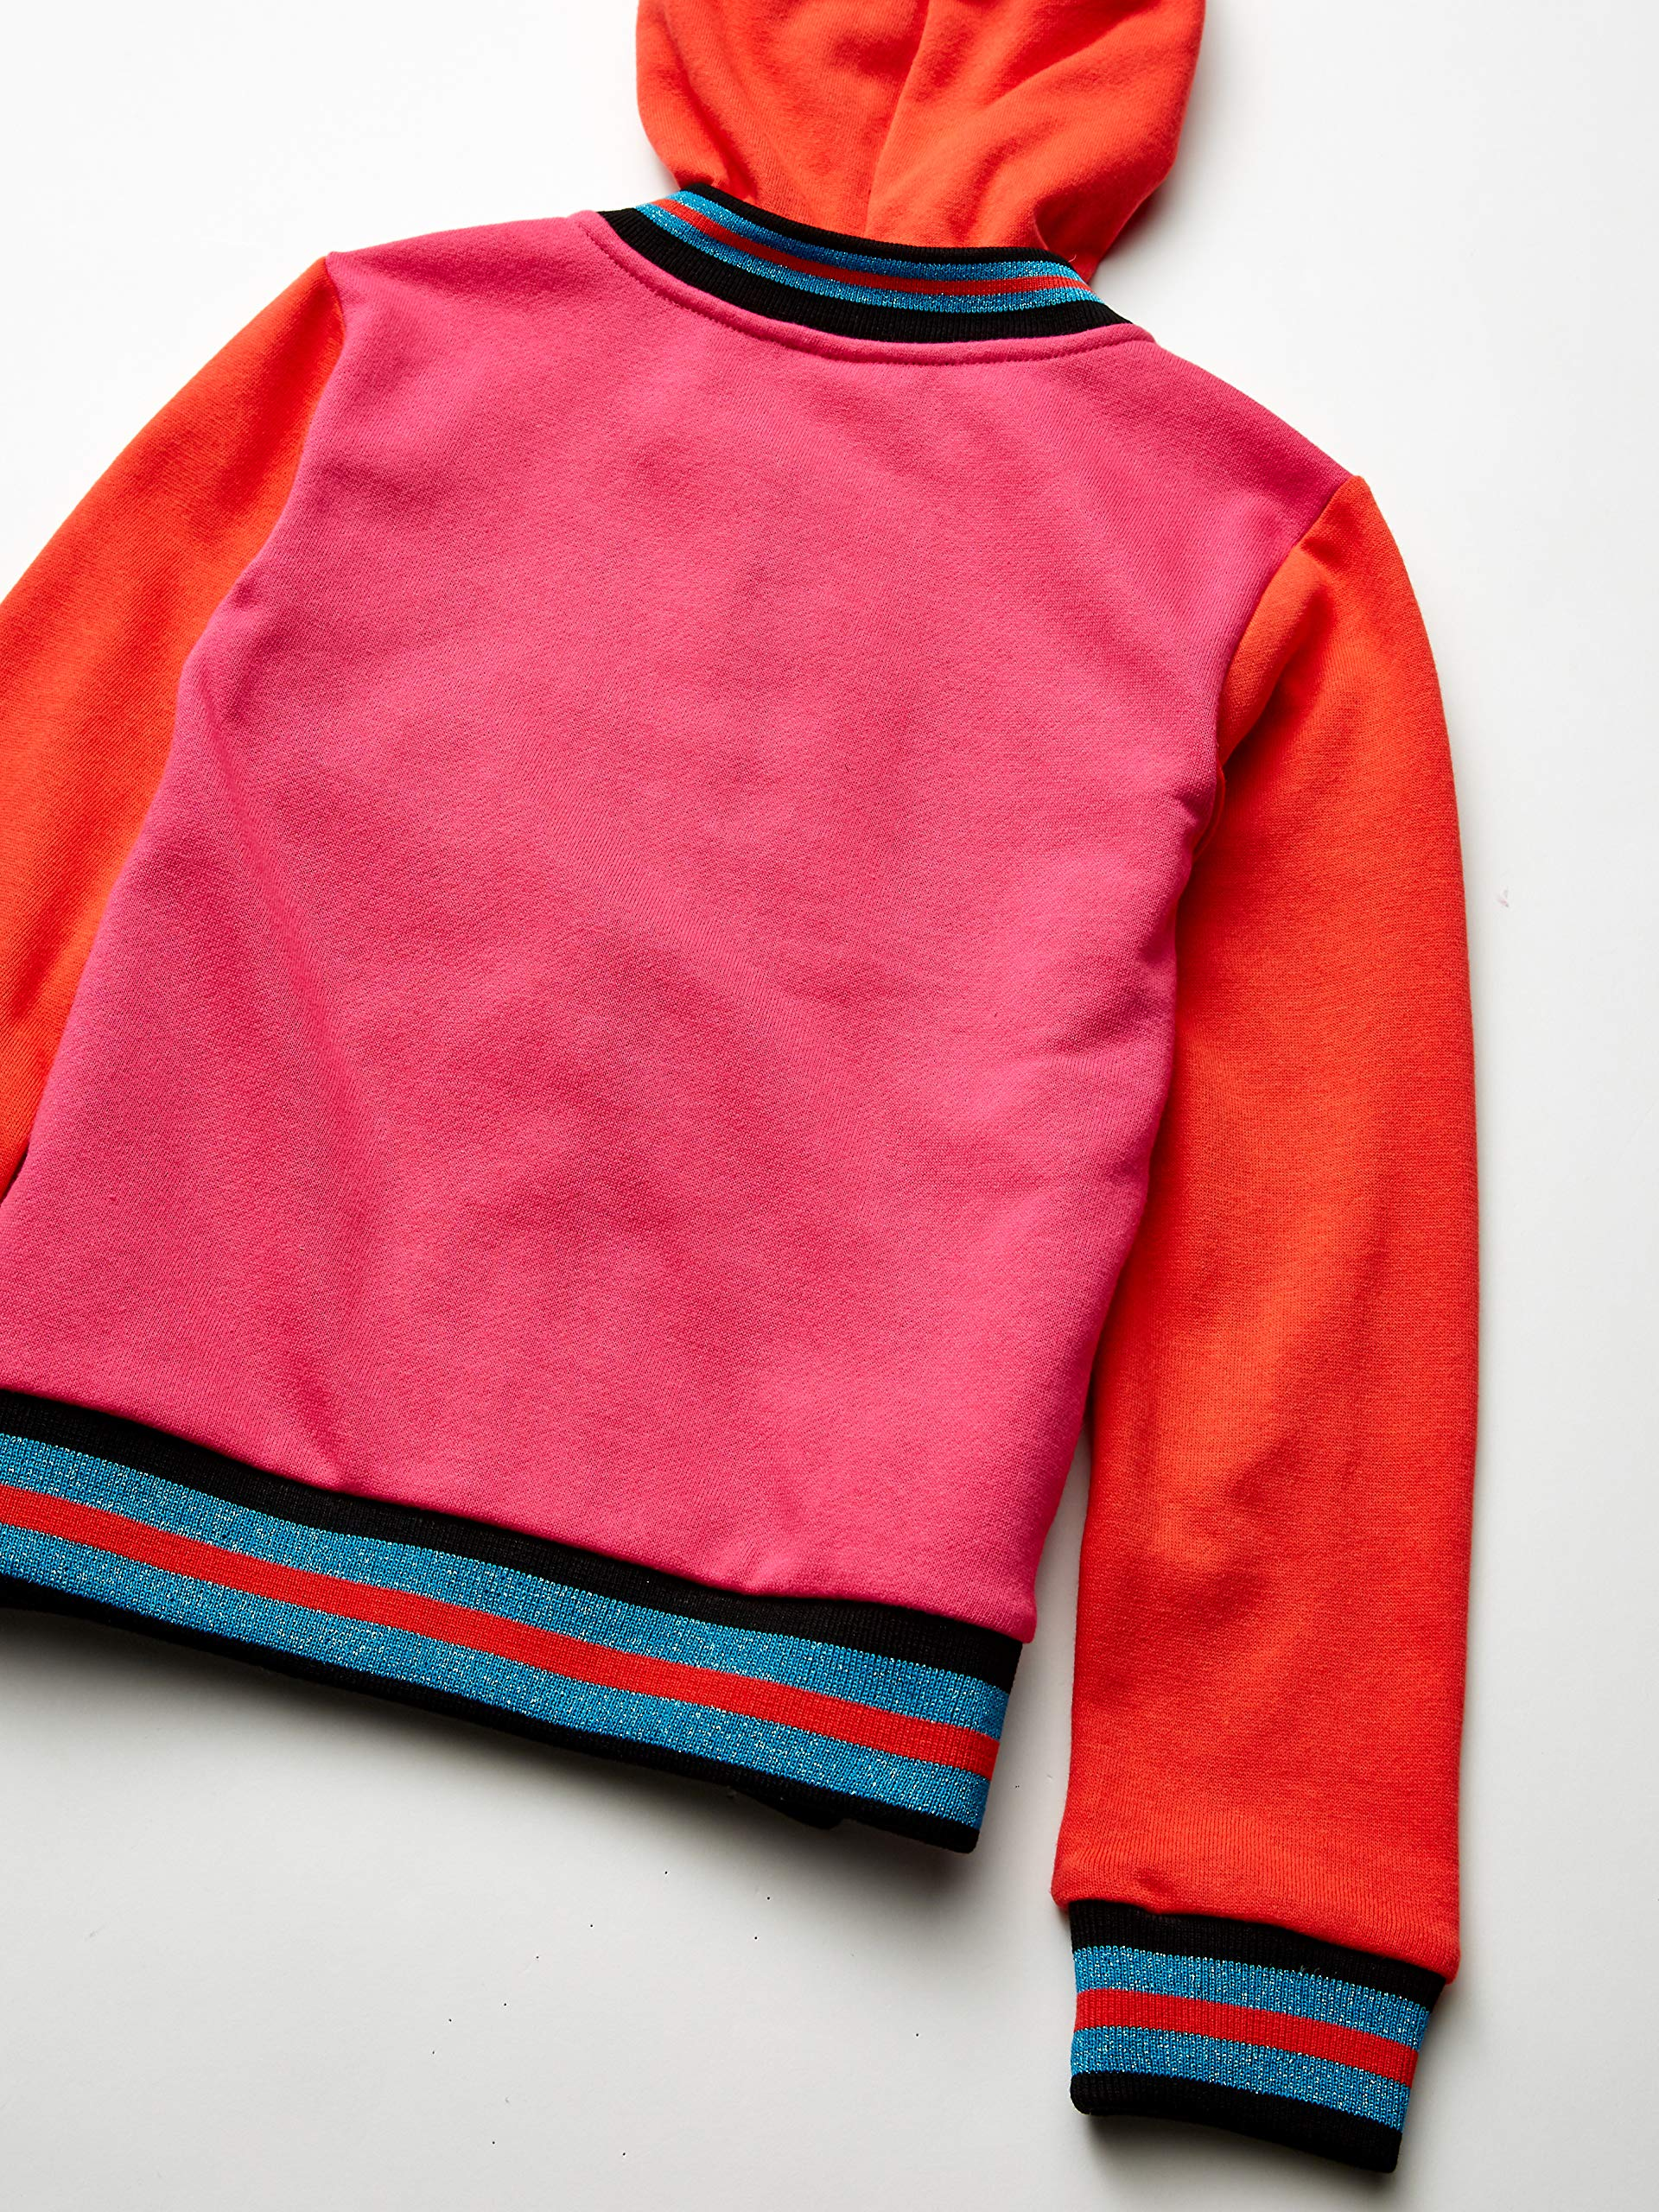 JoJo Siwa Girls' Little Big Bow Zip Up Athletic Hoodie, Red/Hot Pink, S-7 by JoJo Siwa (Image #3)